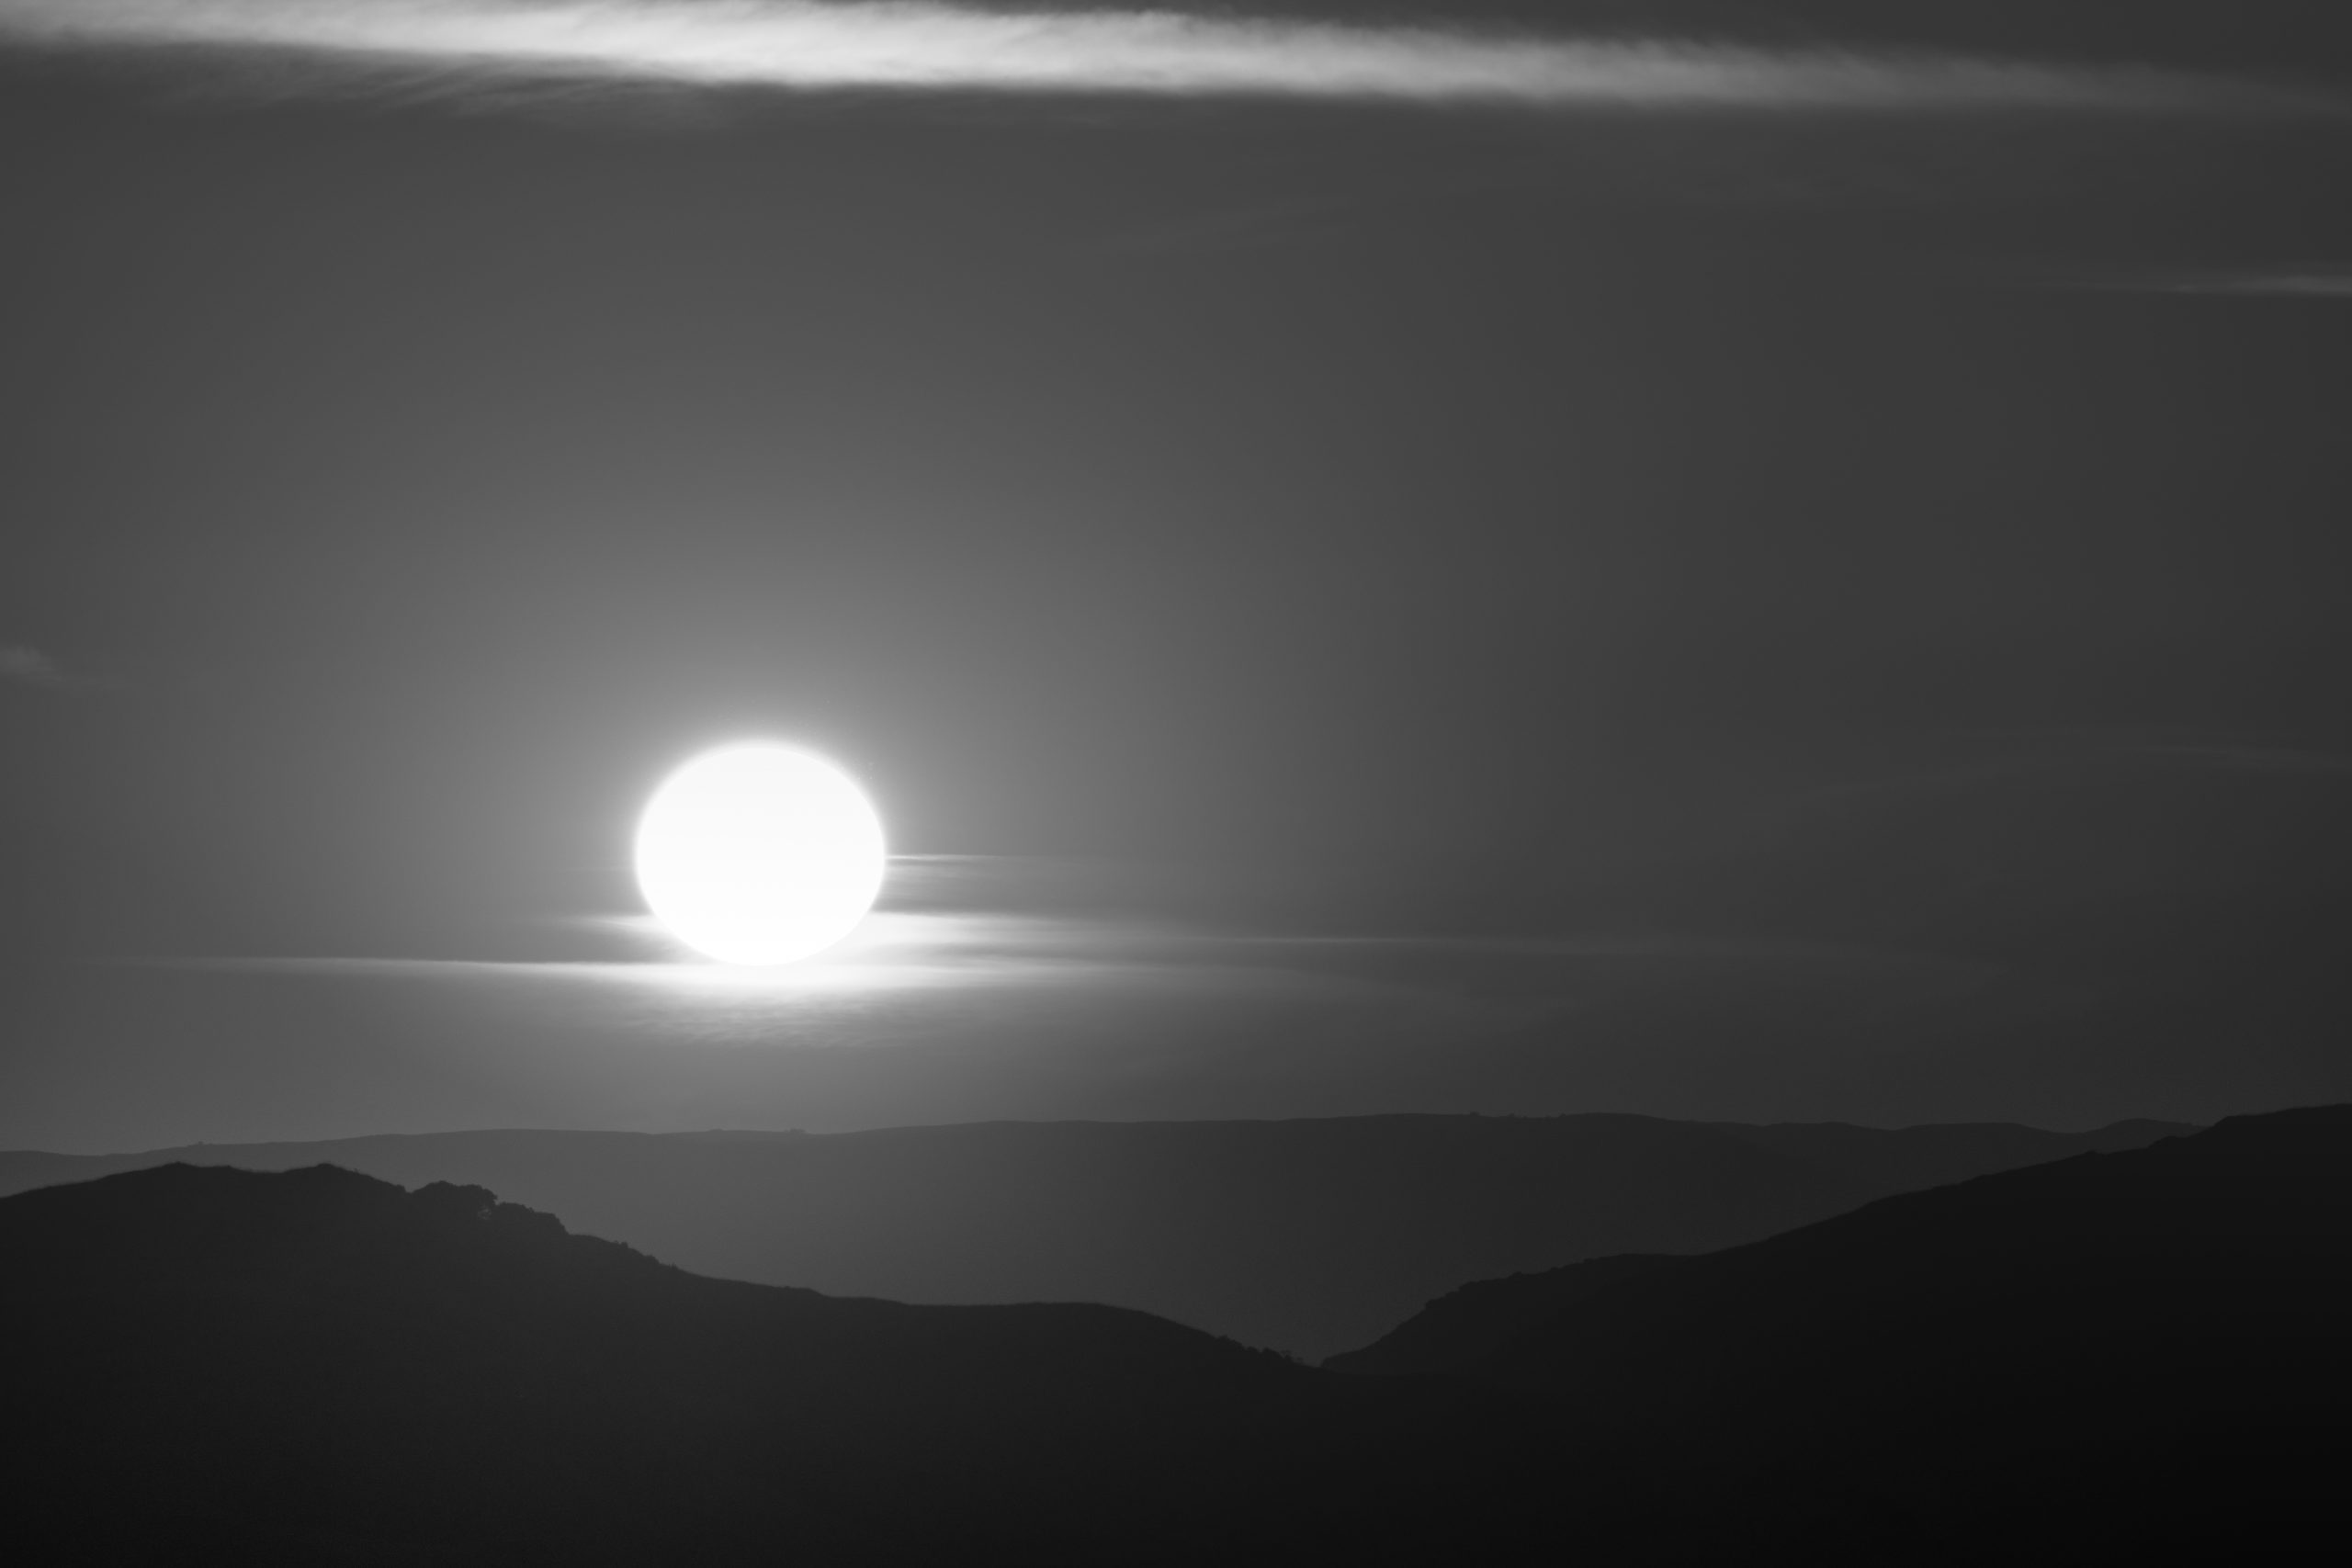 B&W sunset